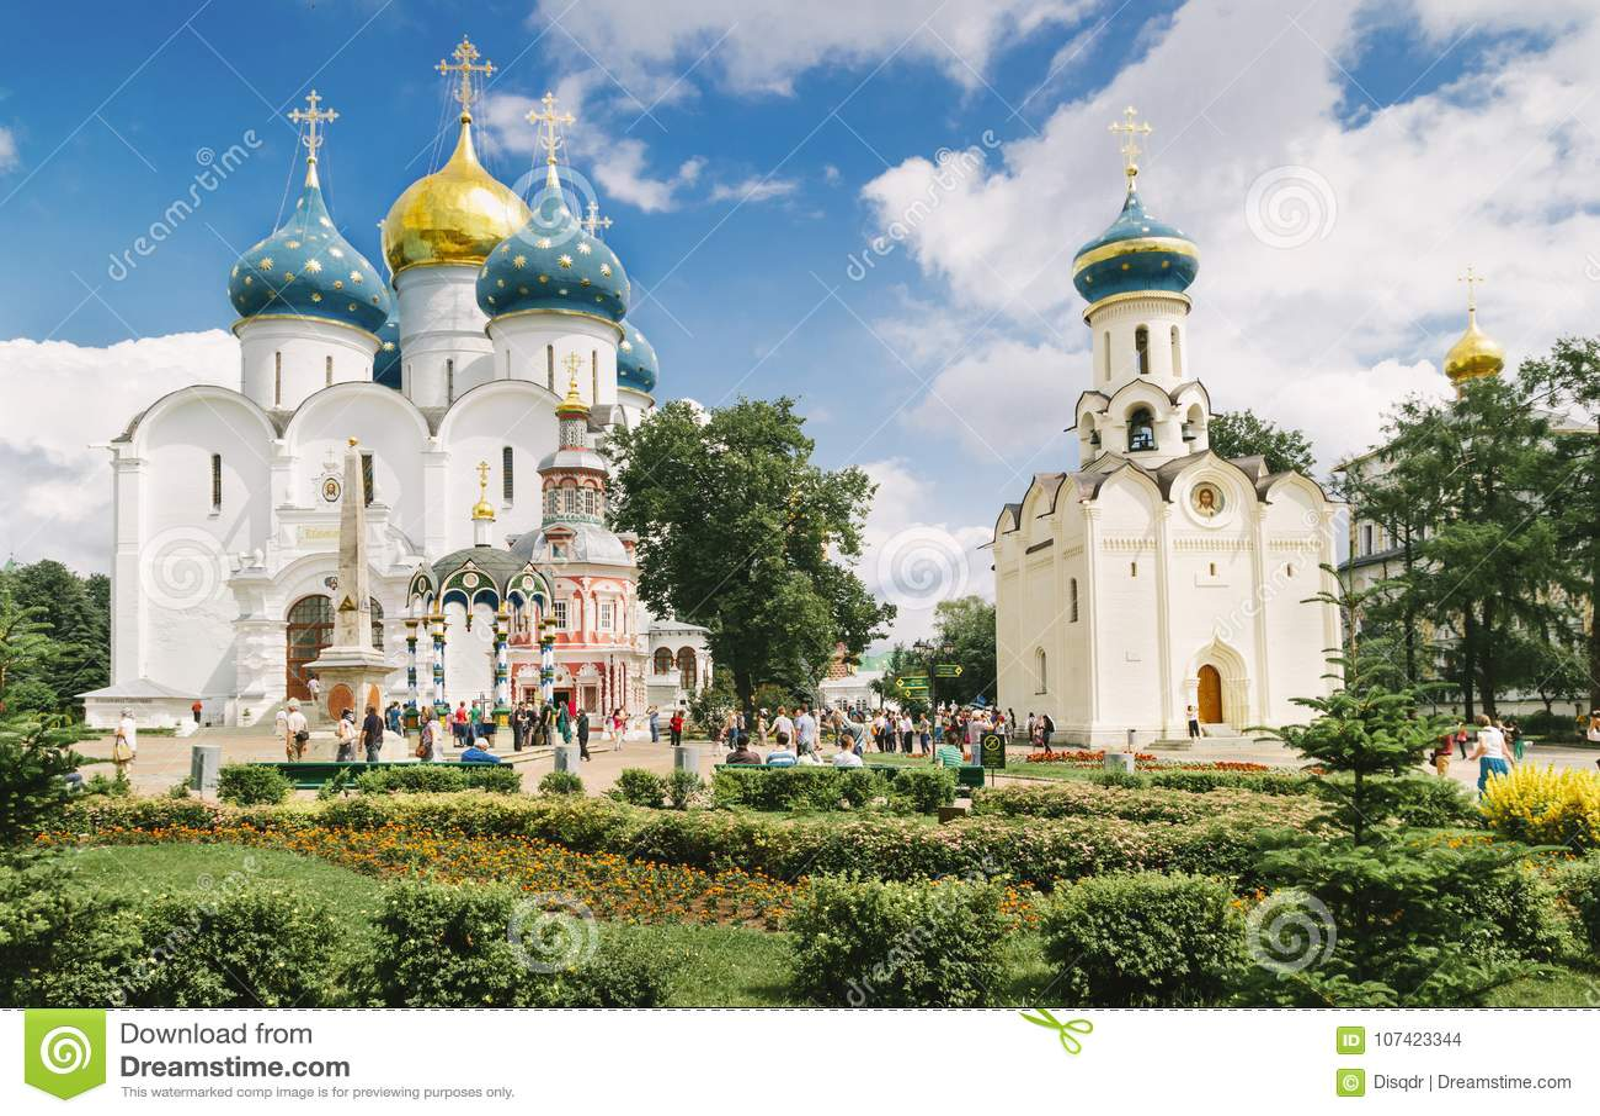 Igrejas em Sergiyev Posad Rússia